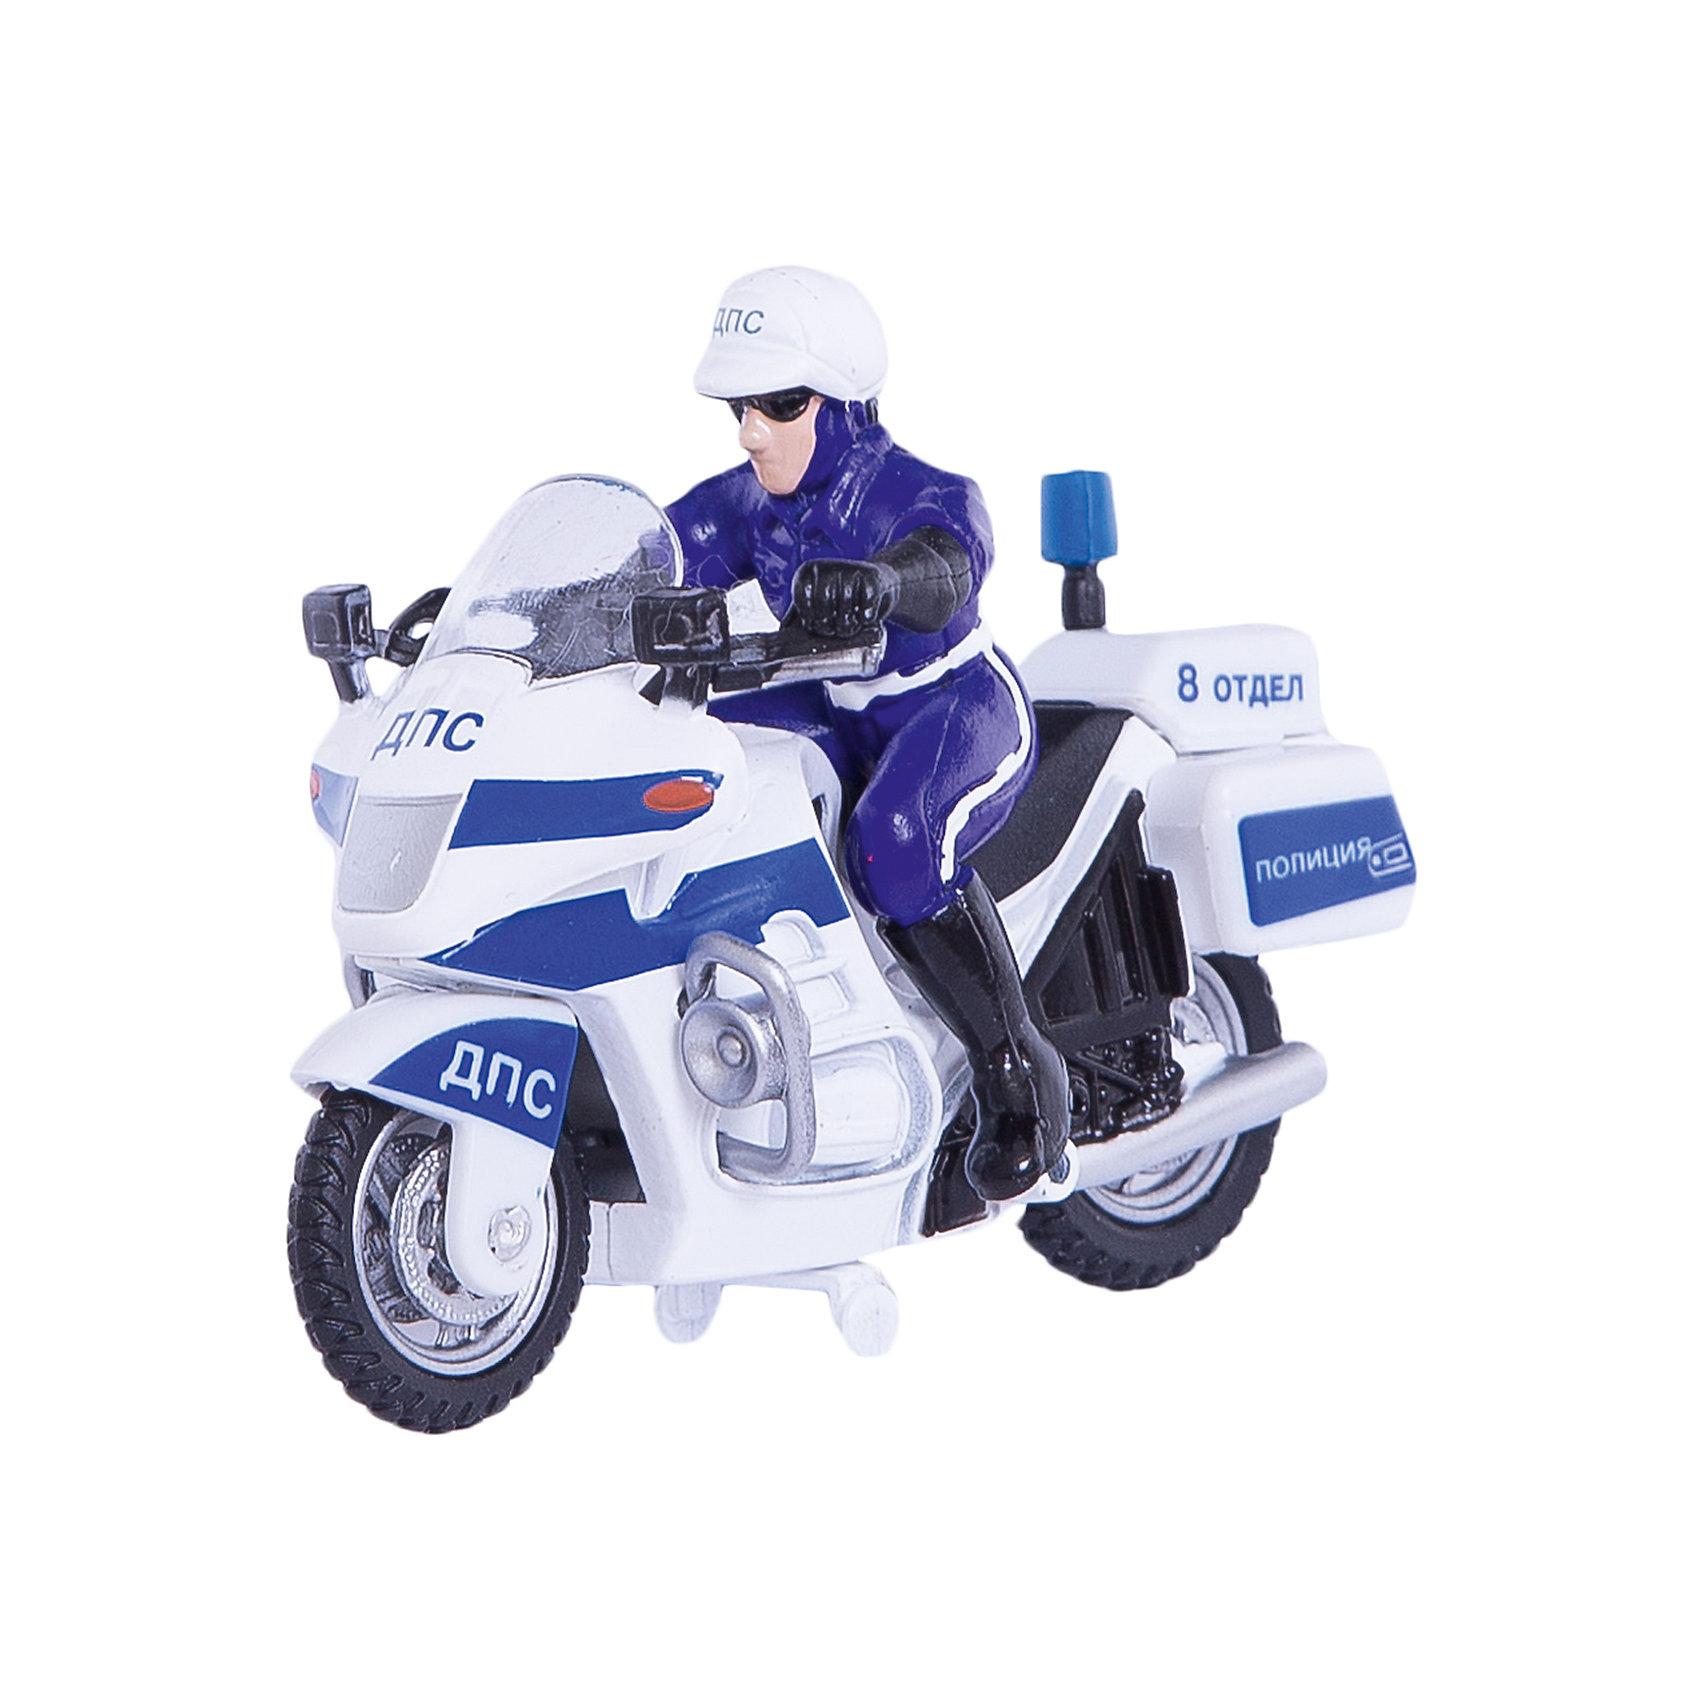 ТЕХНОПАРК ТЕХНОПАРК Металлический мотоцикл какой мотоцикл до 60000рублей